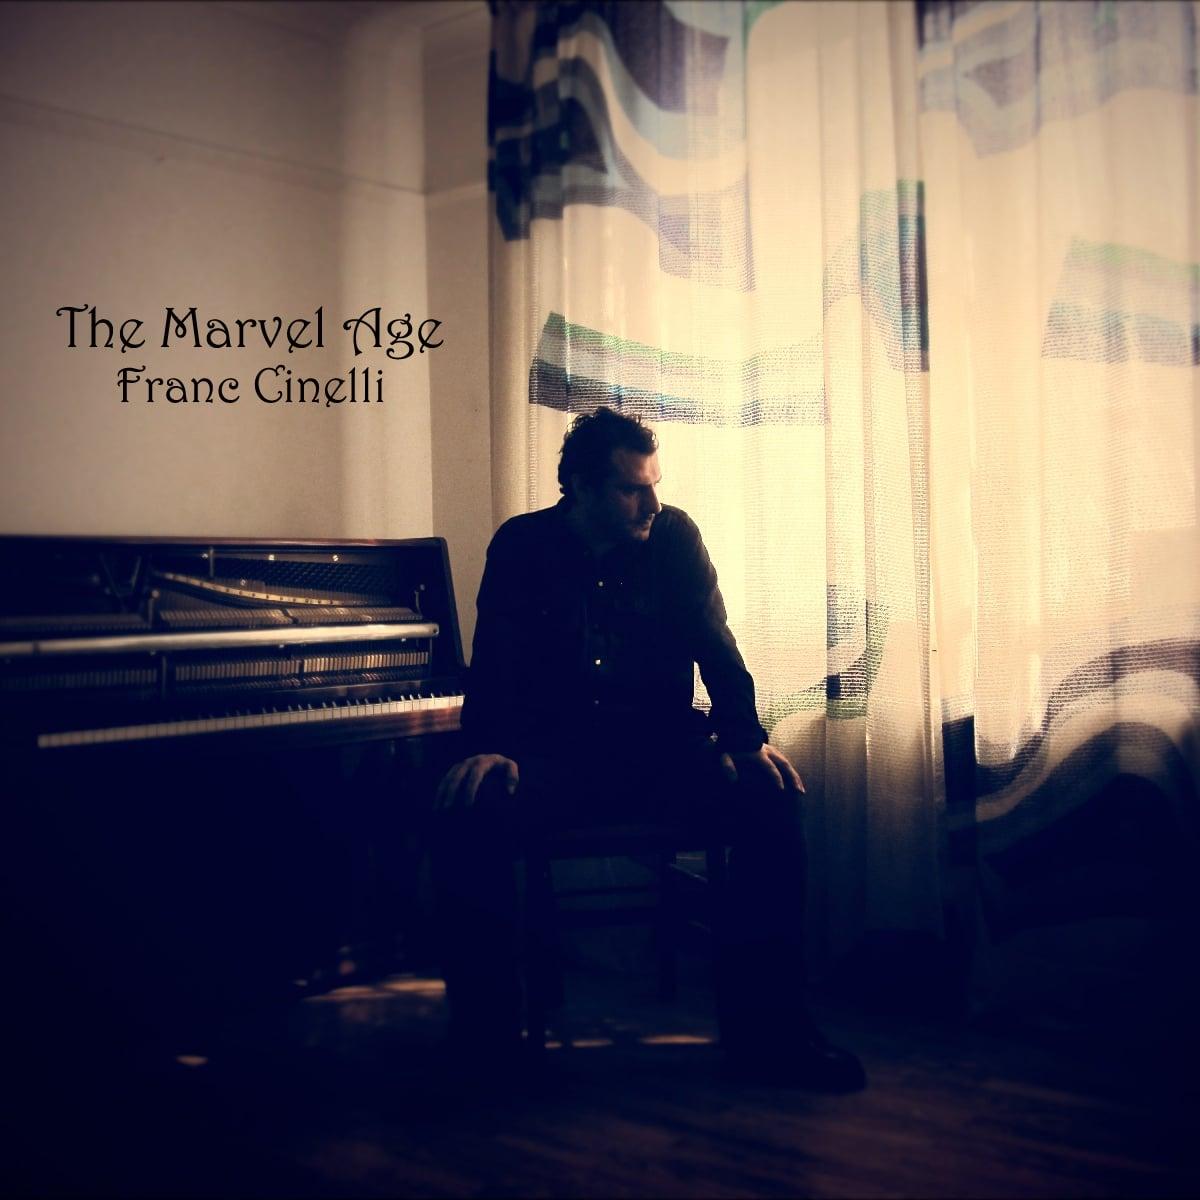 Franc Cinelli - The Marvel Age